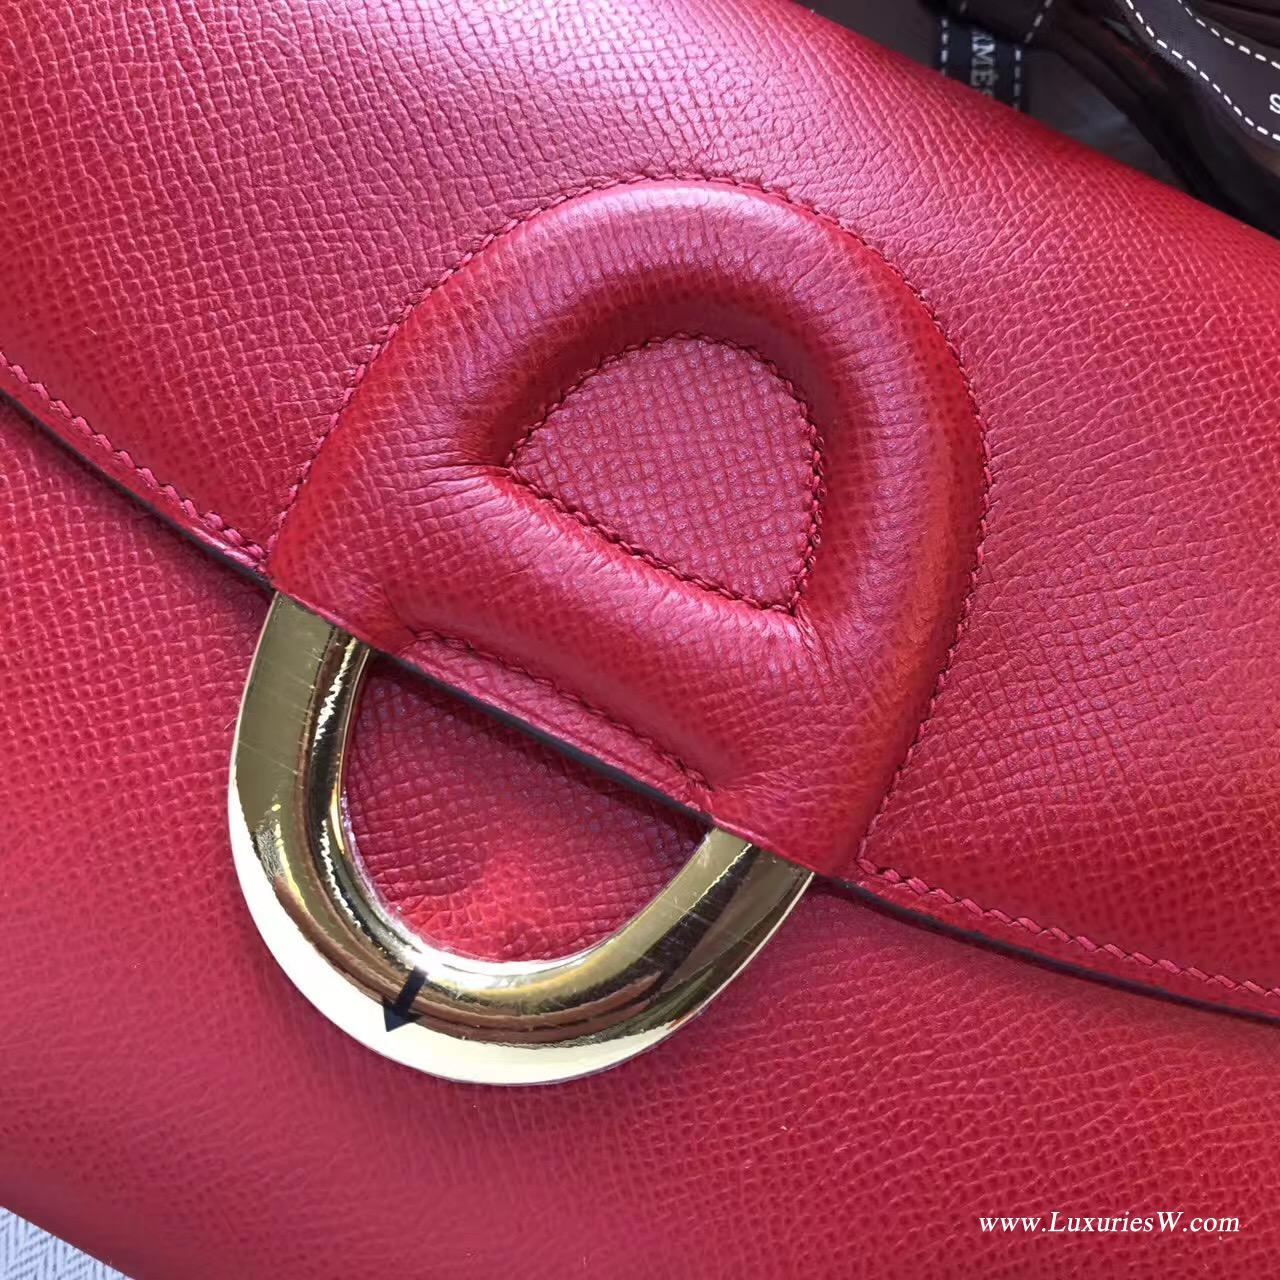 Cherche Epsom Q5 Rouge Cosscks中國紅金扣 最有人氣顏色 Midi鎖扣單肩包